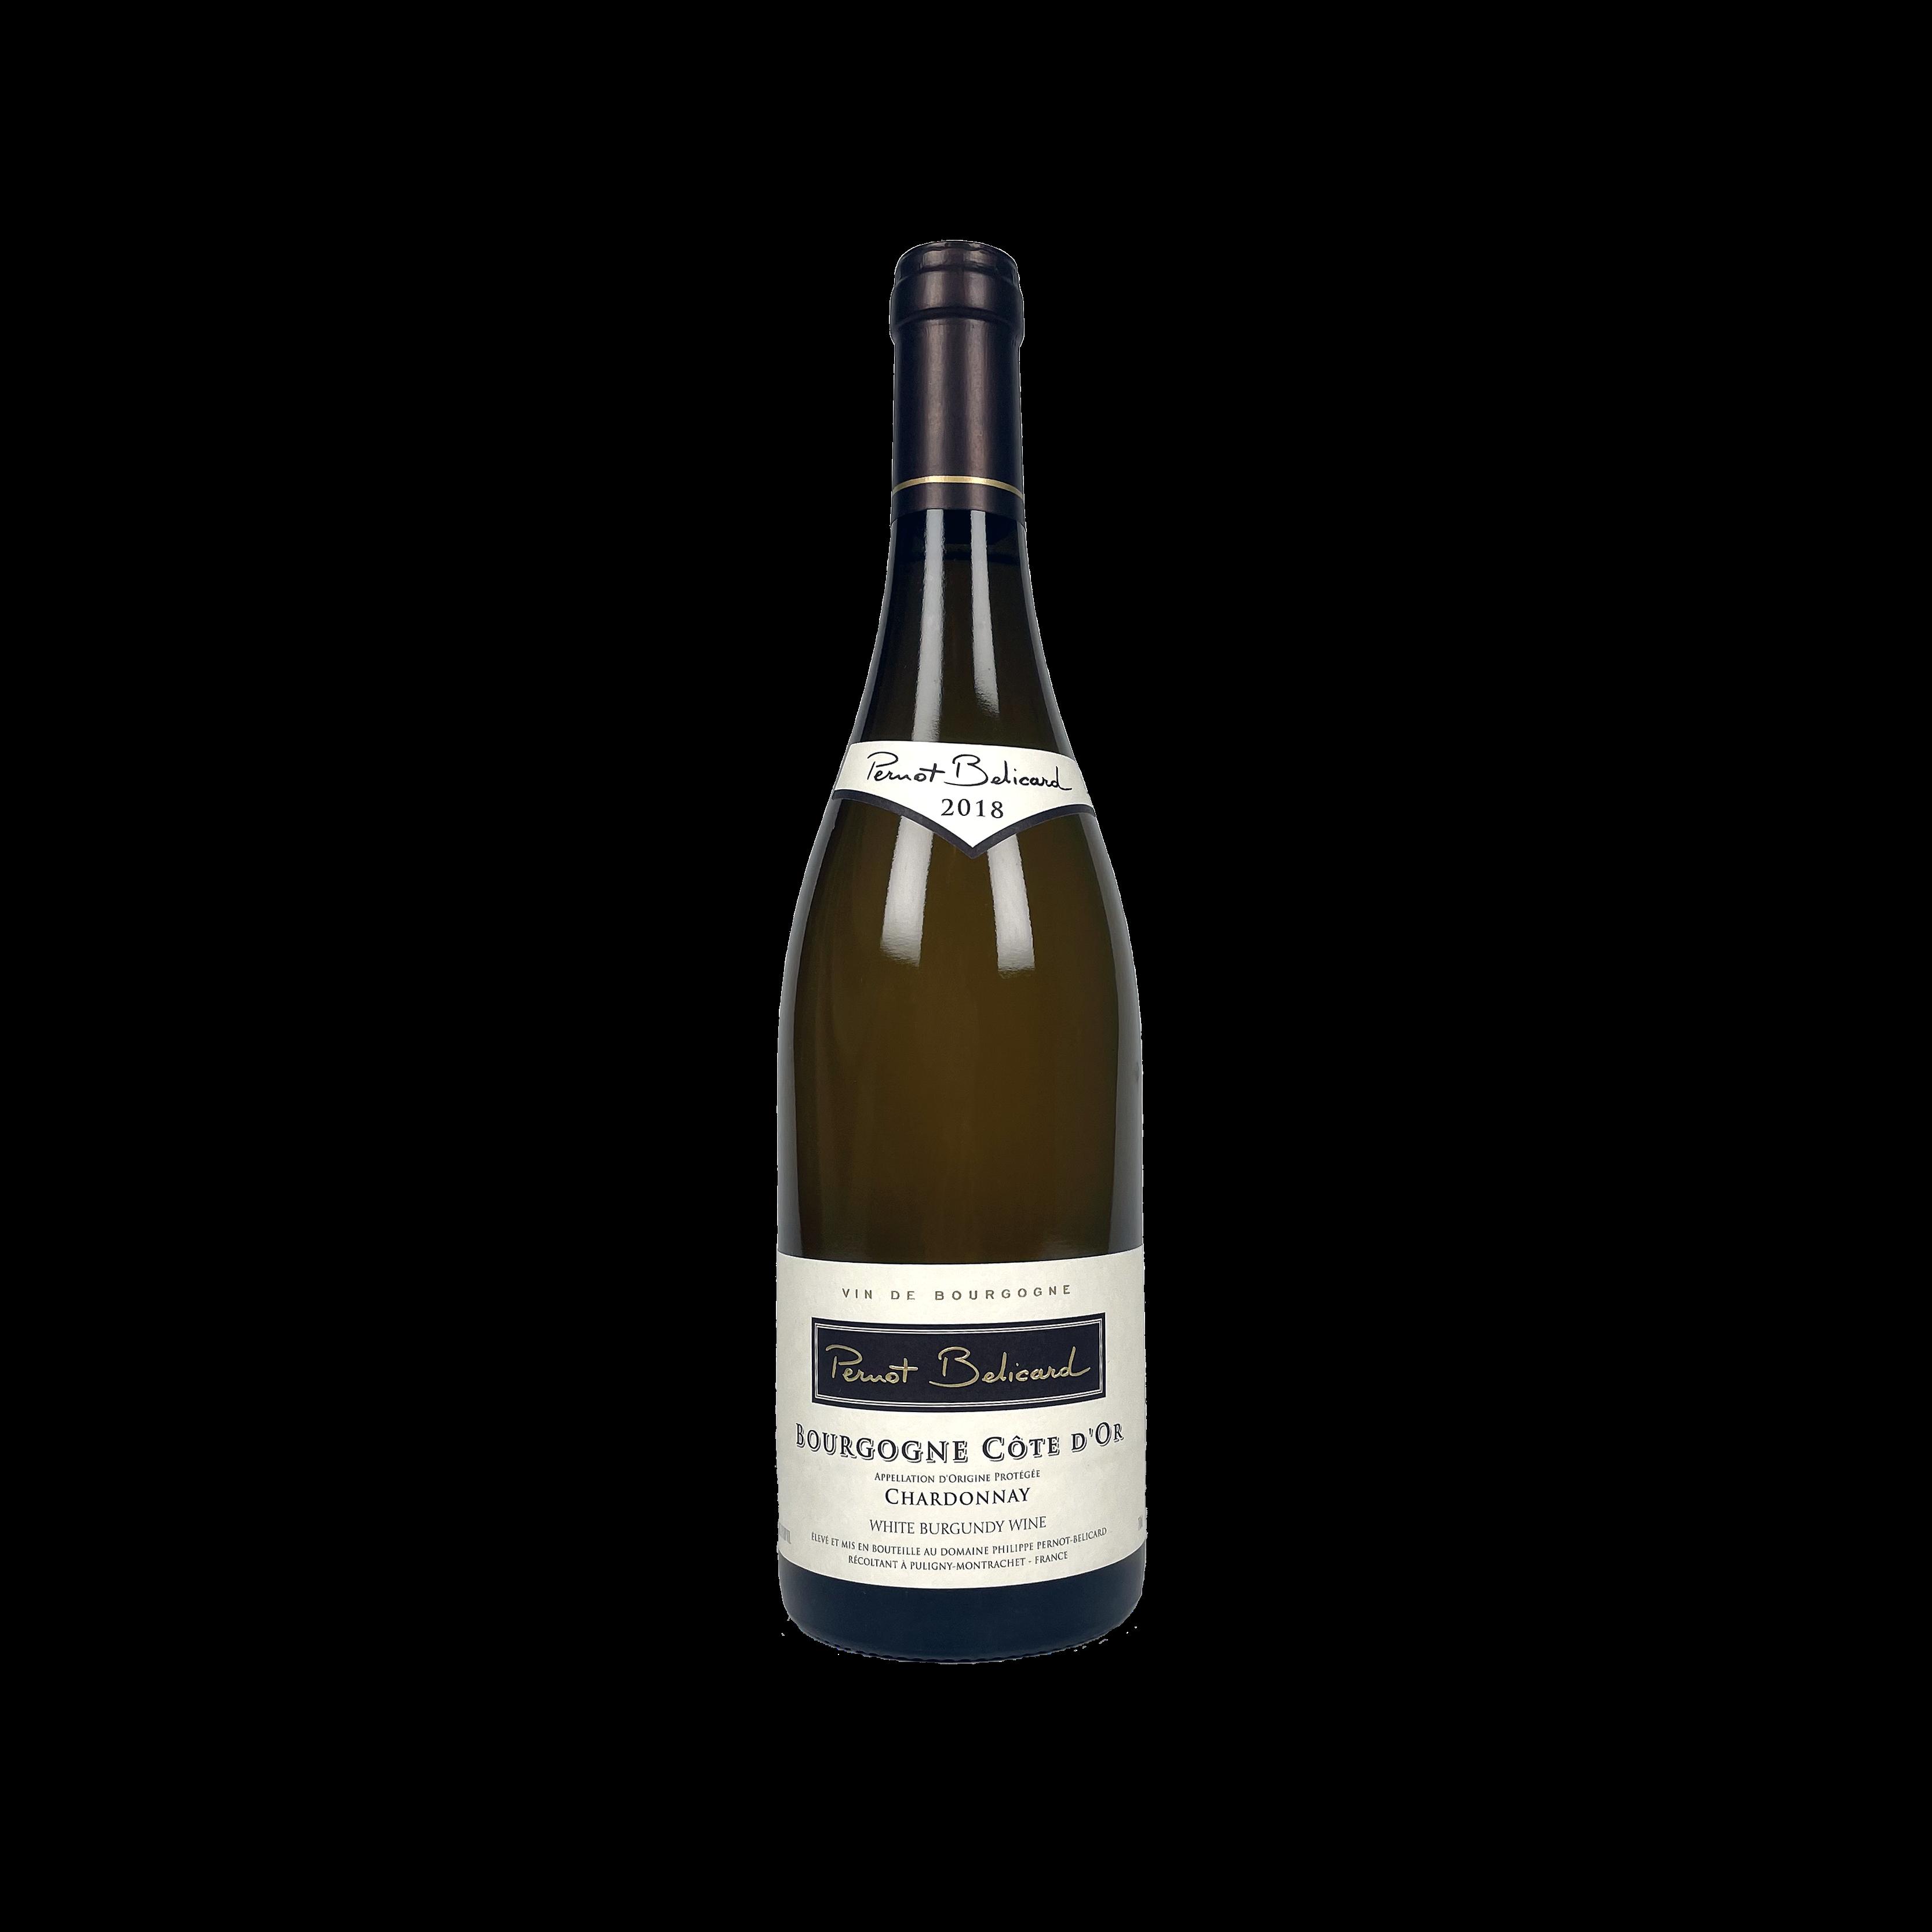 Pernot Belicard Bourgogne Cote D'Or Chardonnay, 2018, 75CL